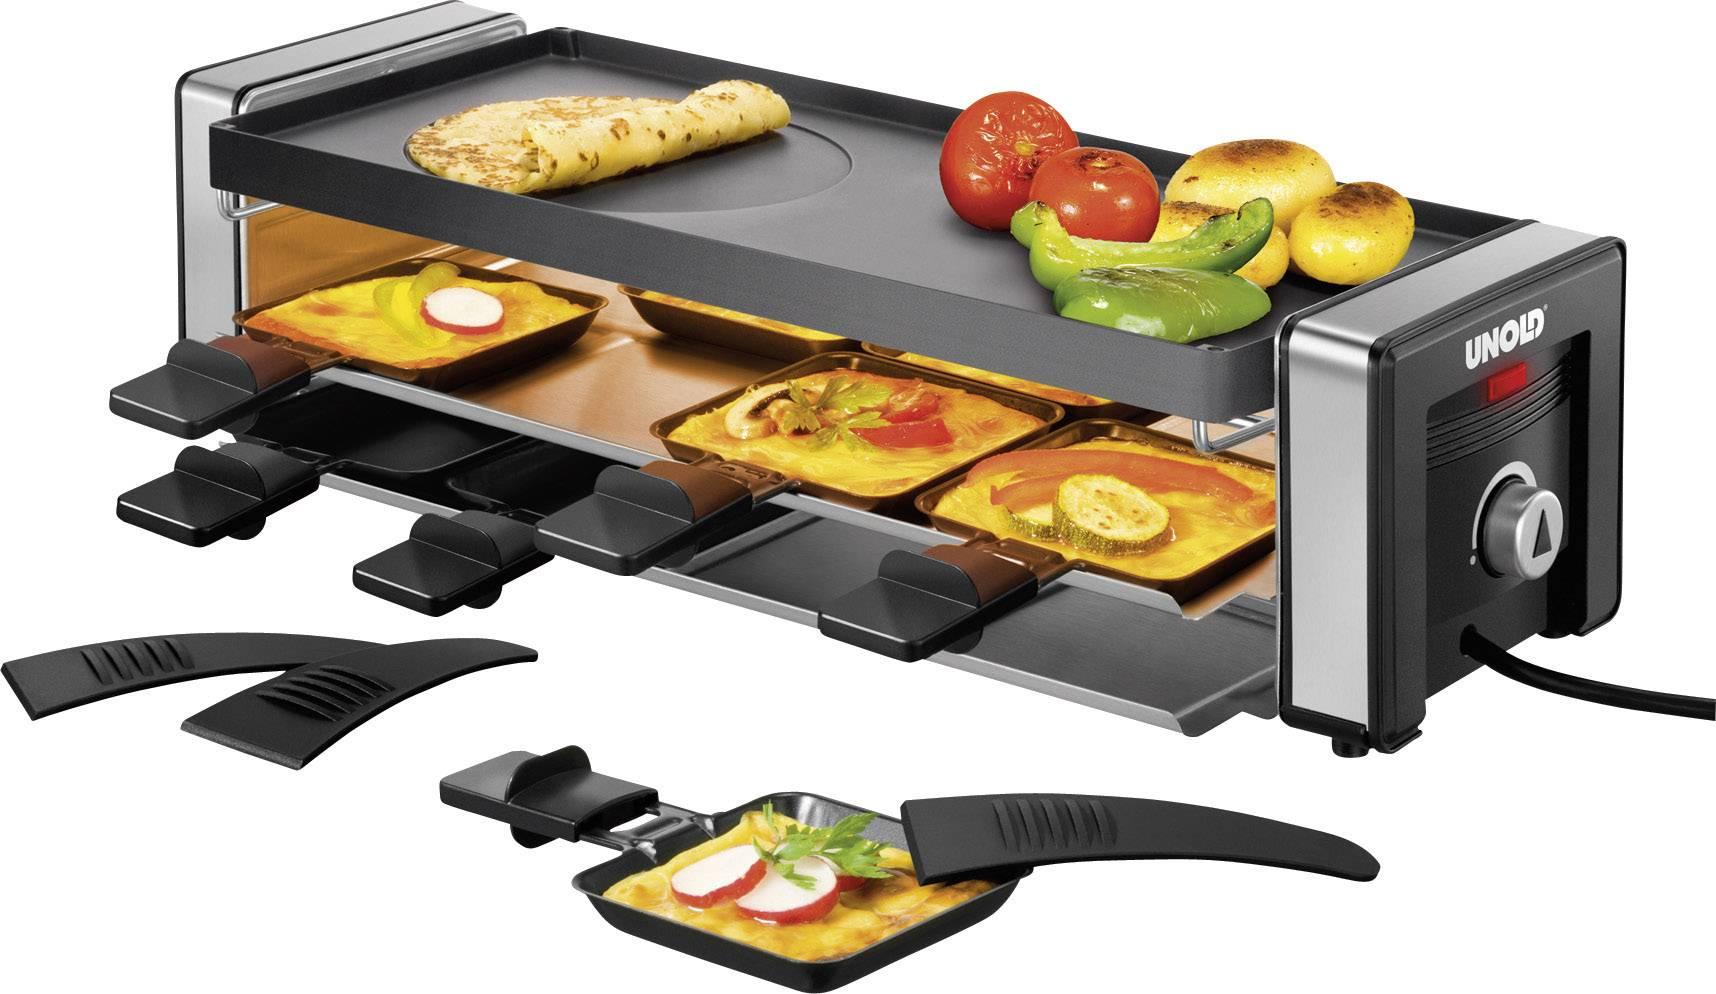 Bomann Kühlschrank Temperatureinstellung : Kühlschrank l siemens energieeffizienzklasse a d a